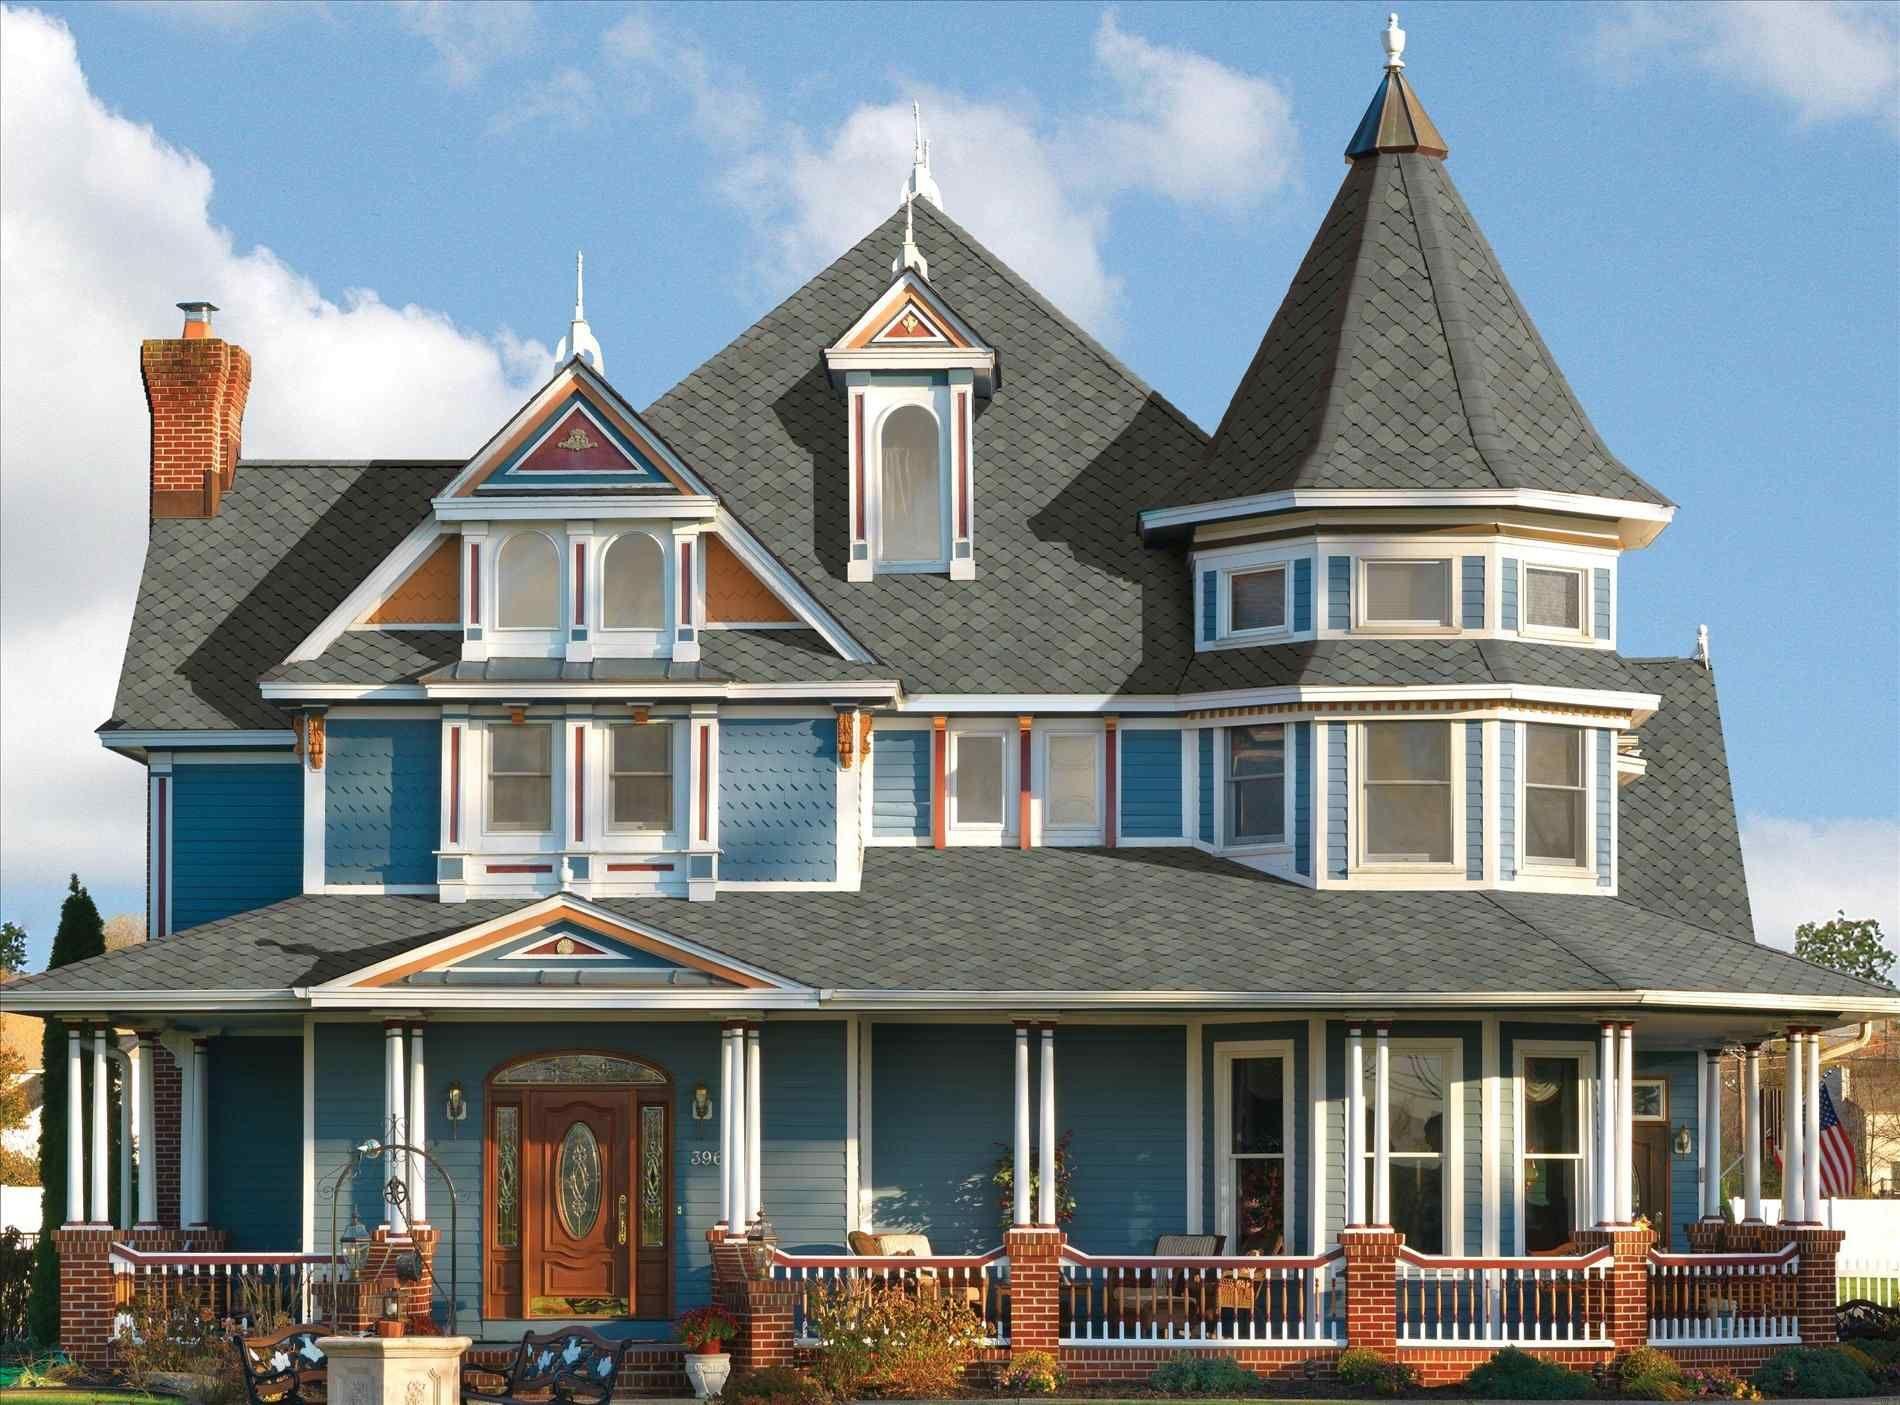 Best Diamond Shaped Roof Shingles Roof Design Cedar Shingle 400 x 300